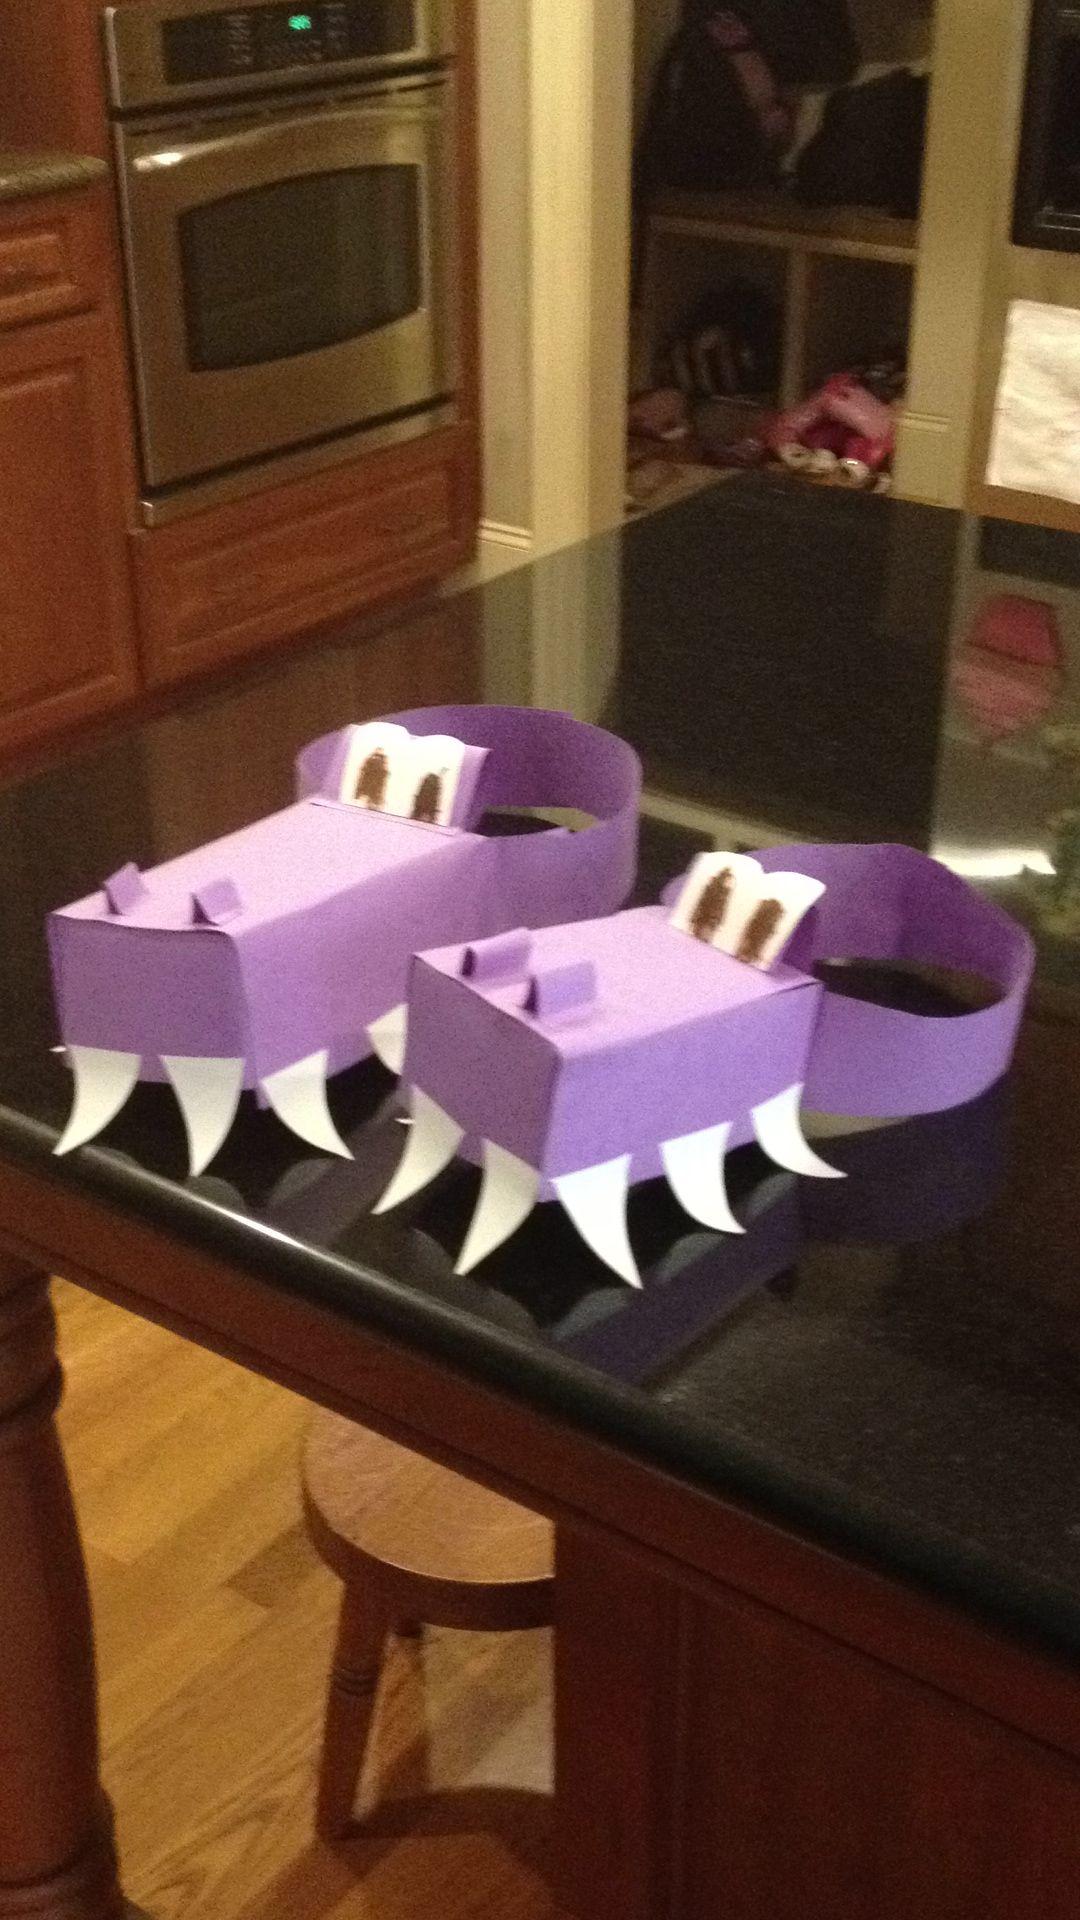 Construction Paper Crocodile Hats